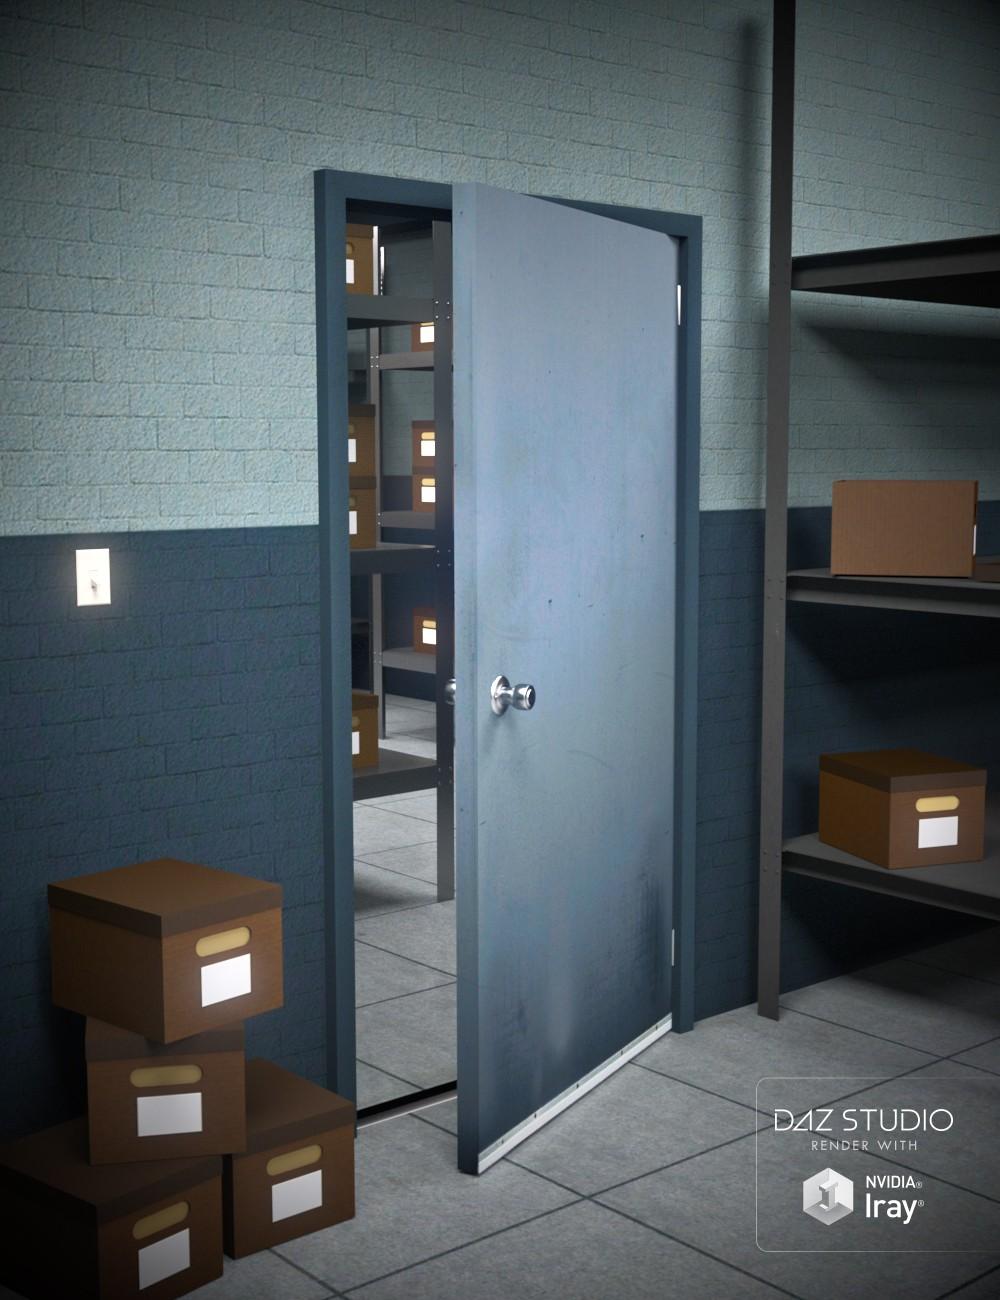 Download daz studio 3 for free daz 3d police storage room for Living room 2 for daz studio